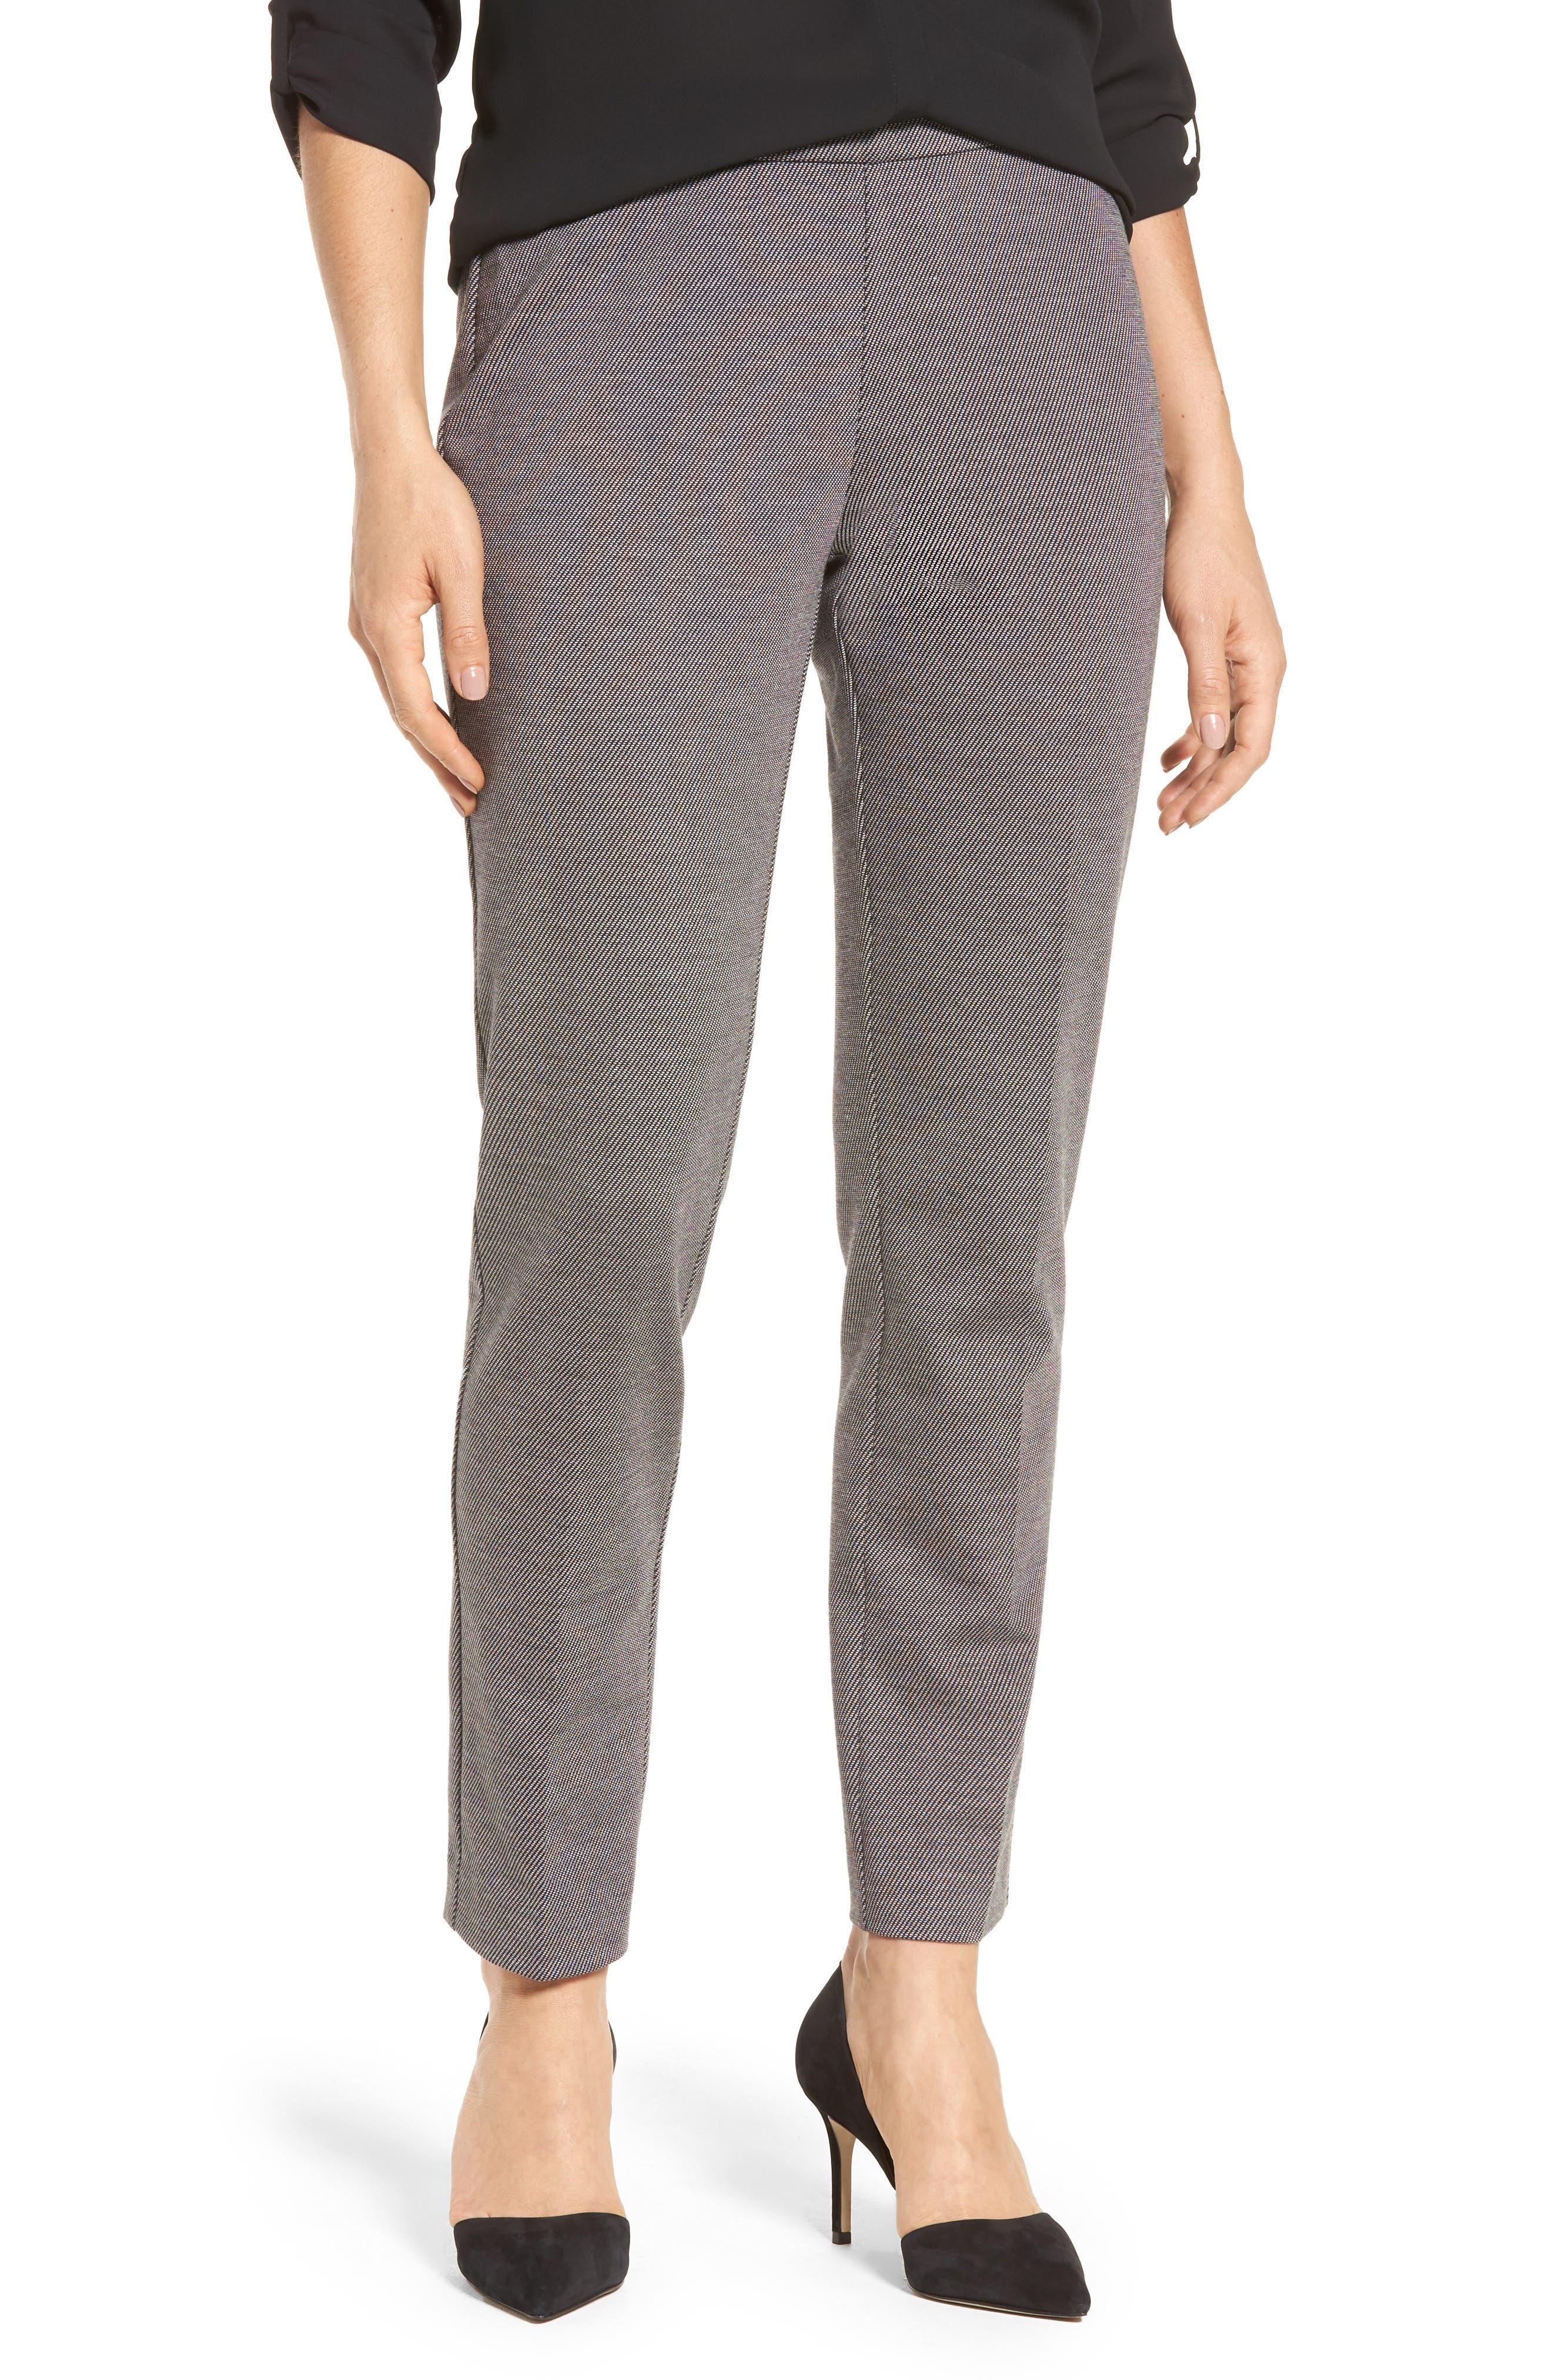 Slim Twill Ponte Knit Pants,                         Main,                         color, Rich Black